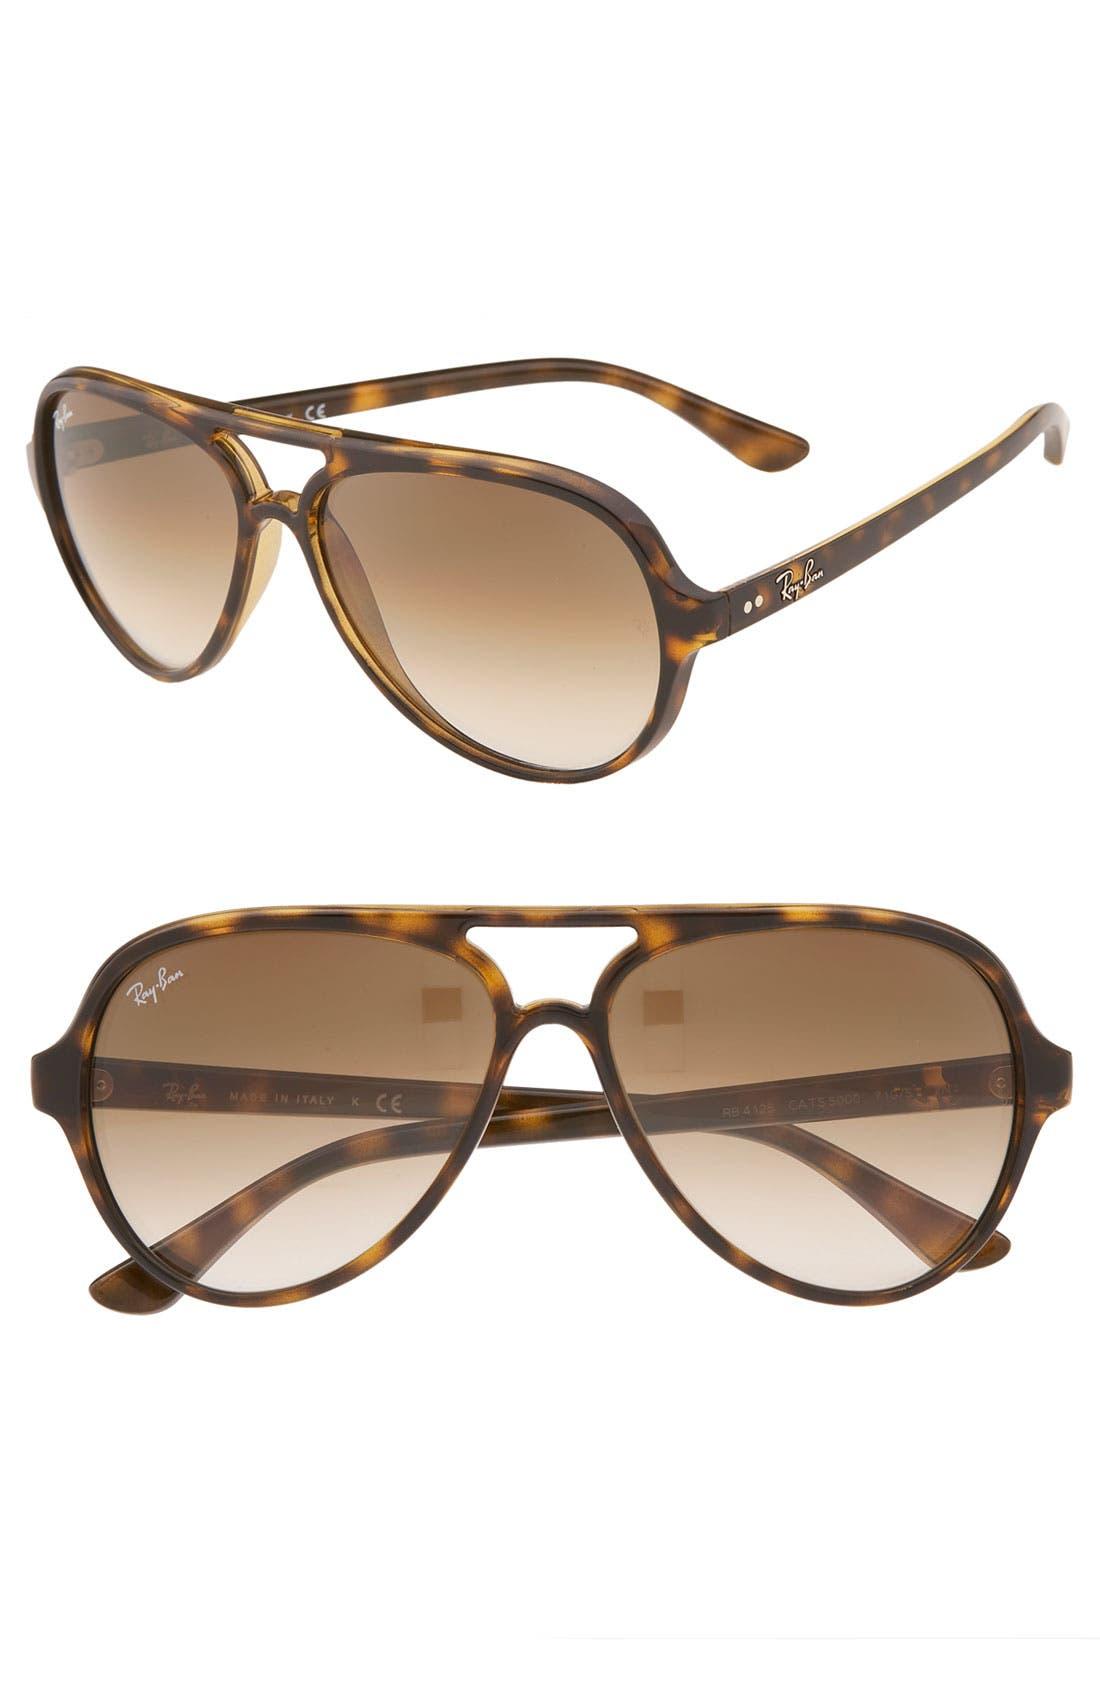 59mm Resin Aviator Sunglasses,                             Main thumbnail 1, color,                             Light Havana